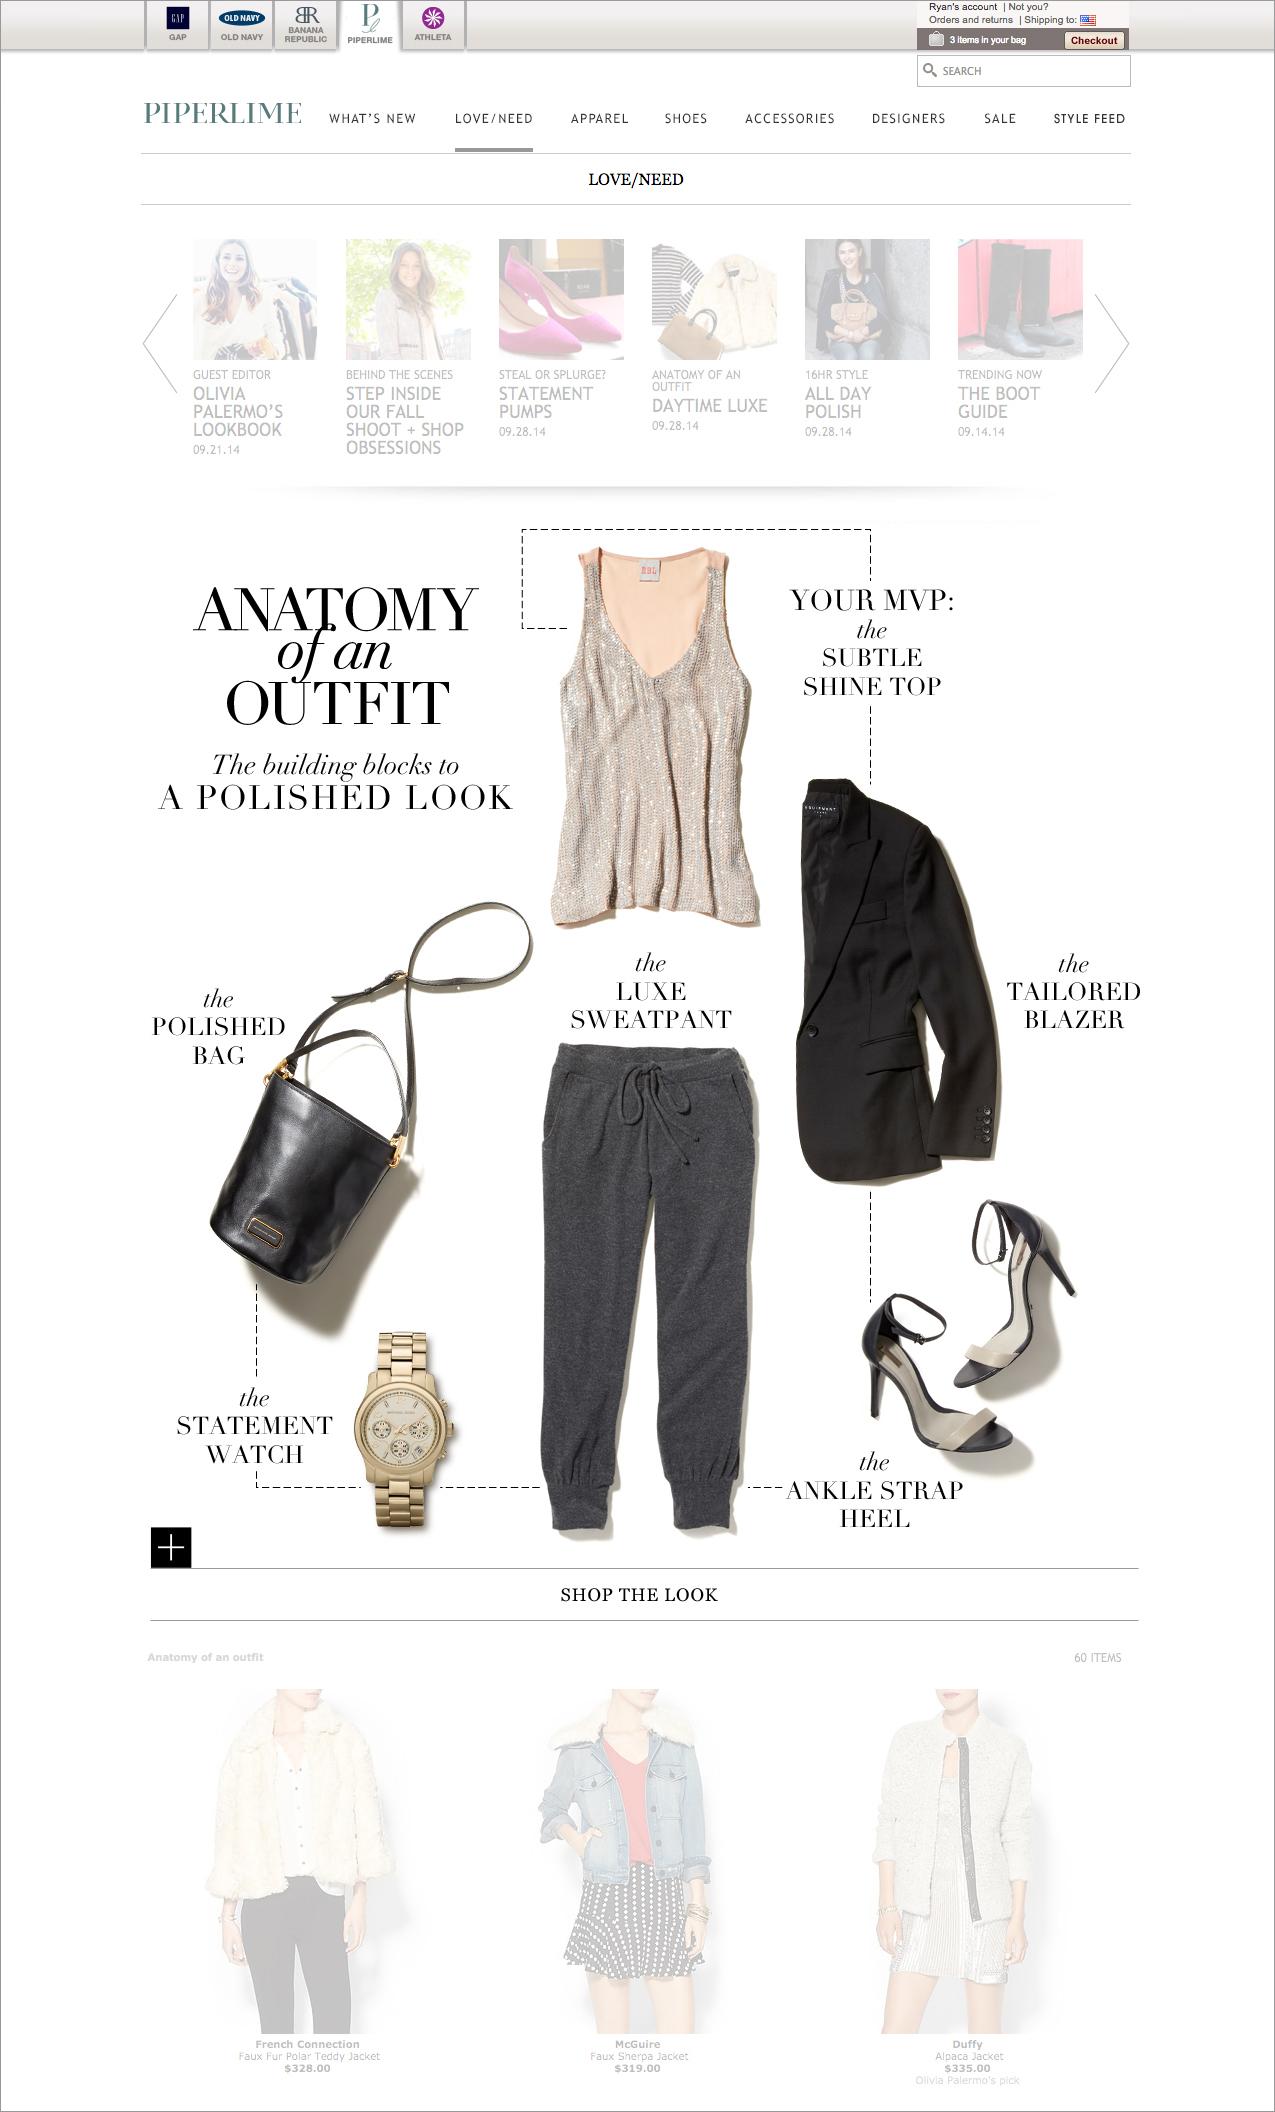 10.24_Anatomy-of-an-Outfit_SubtleShine_BB.jpg